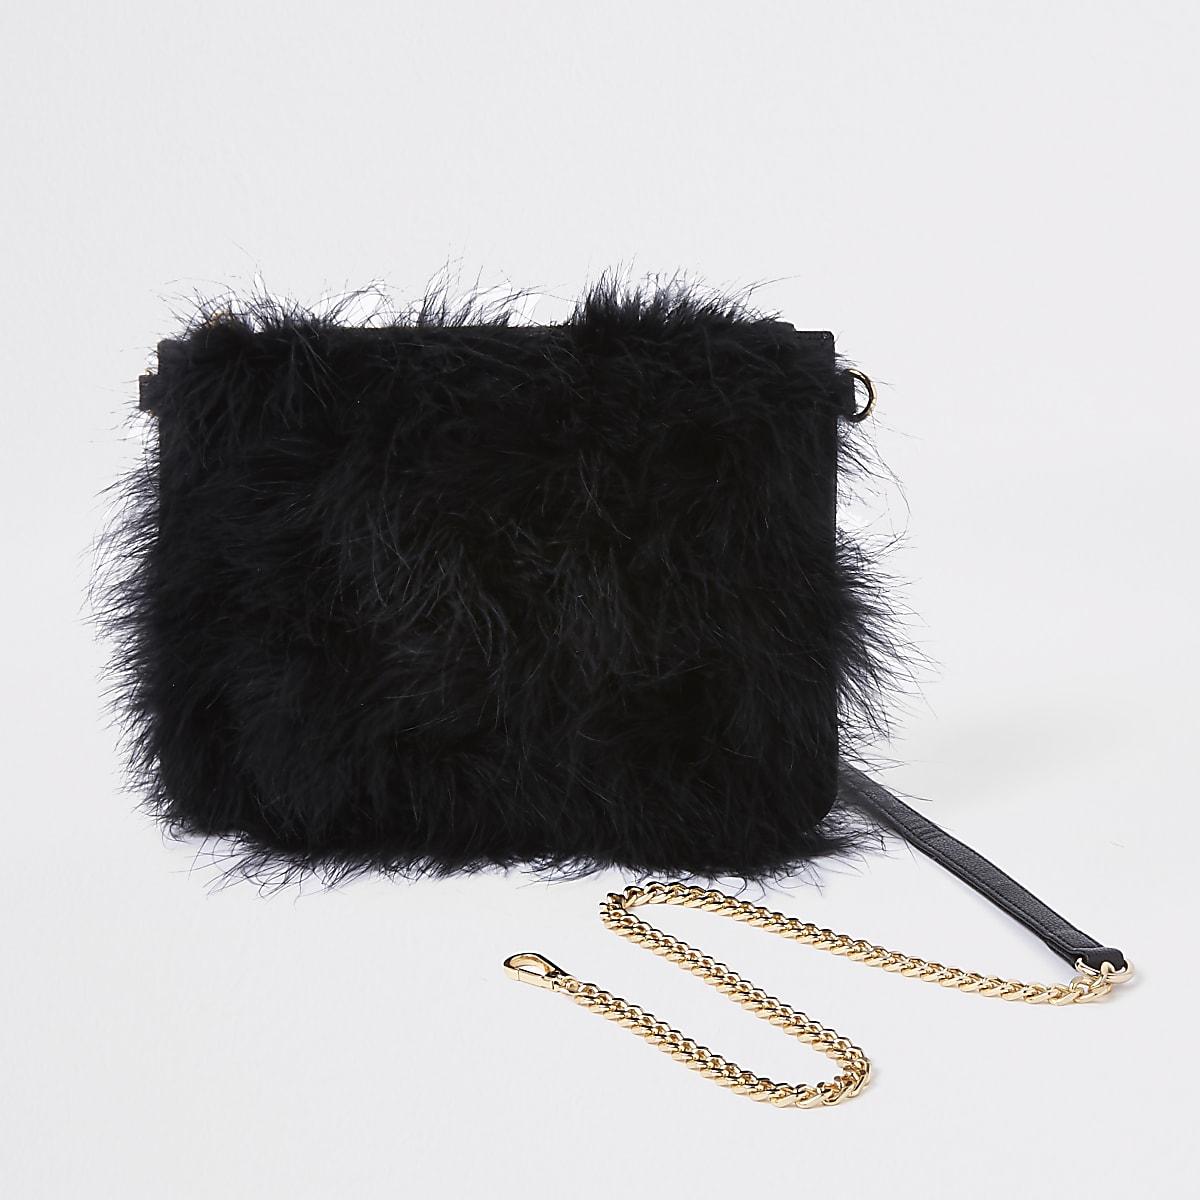 Black marabou feather cross body pouch bag